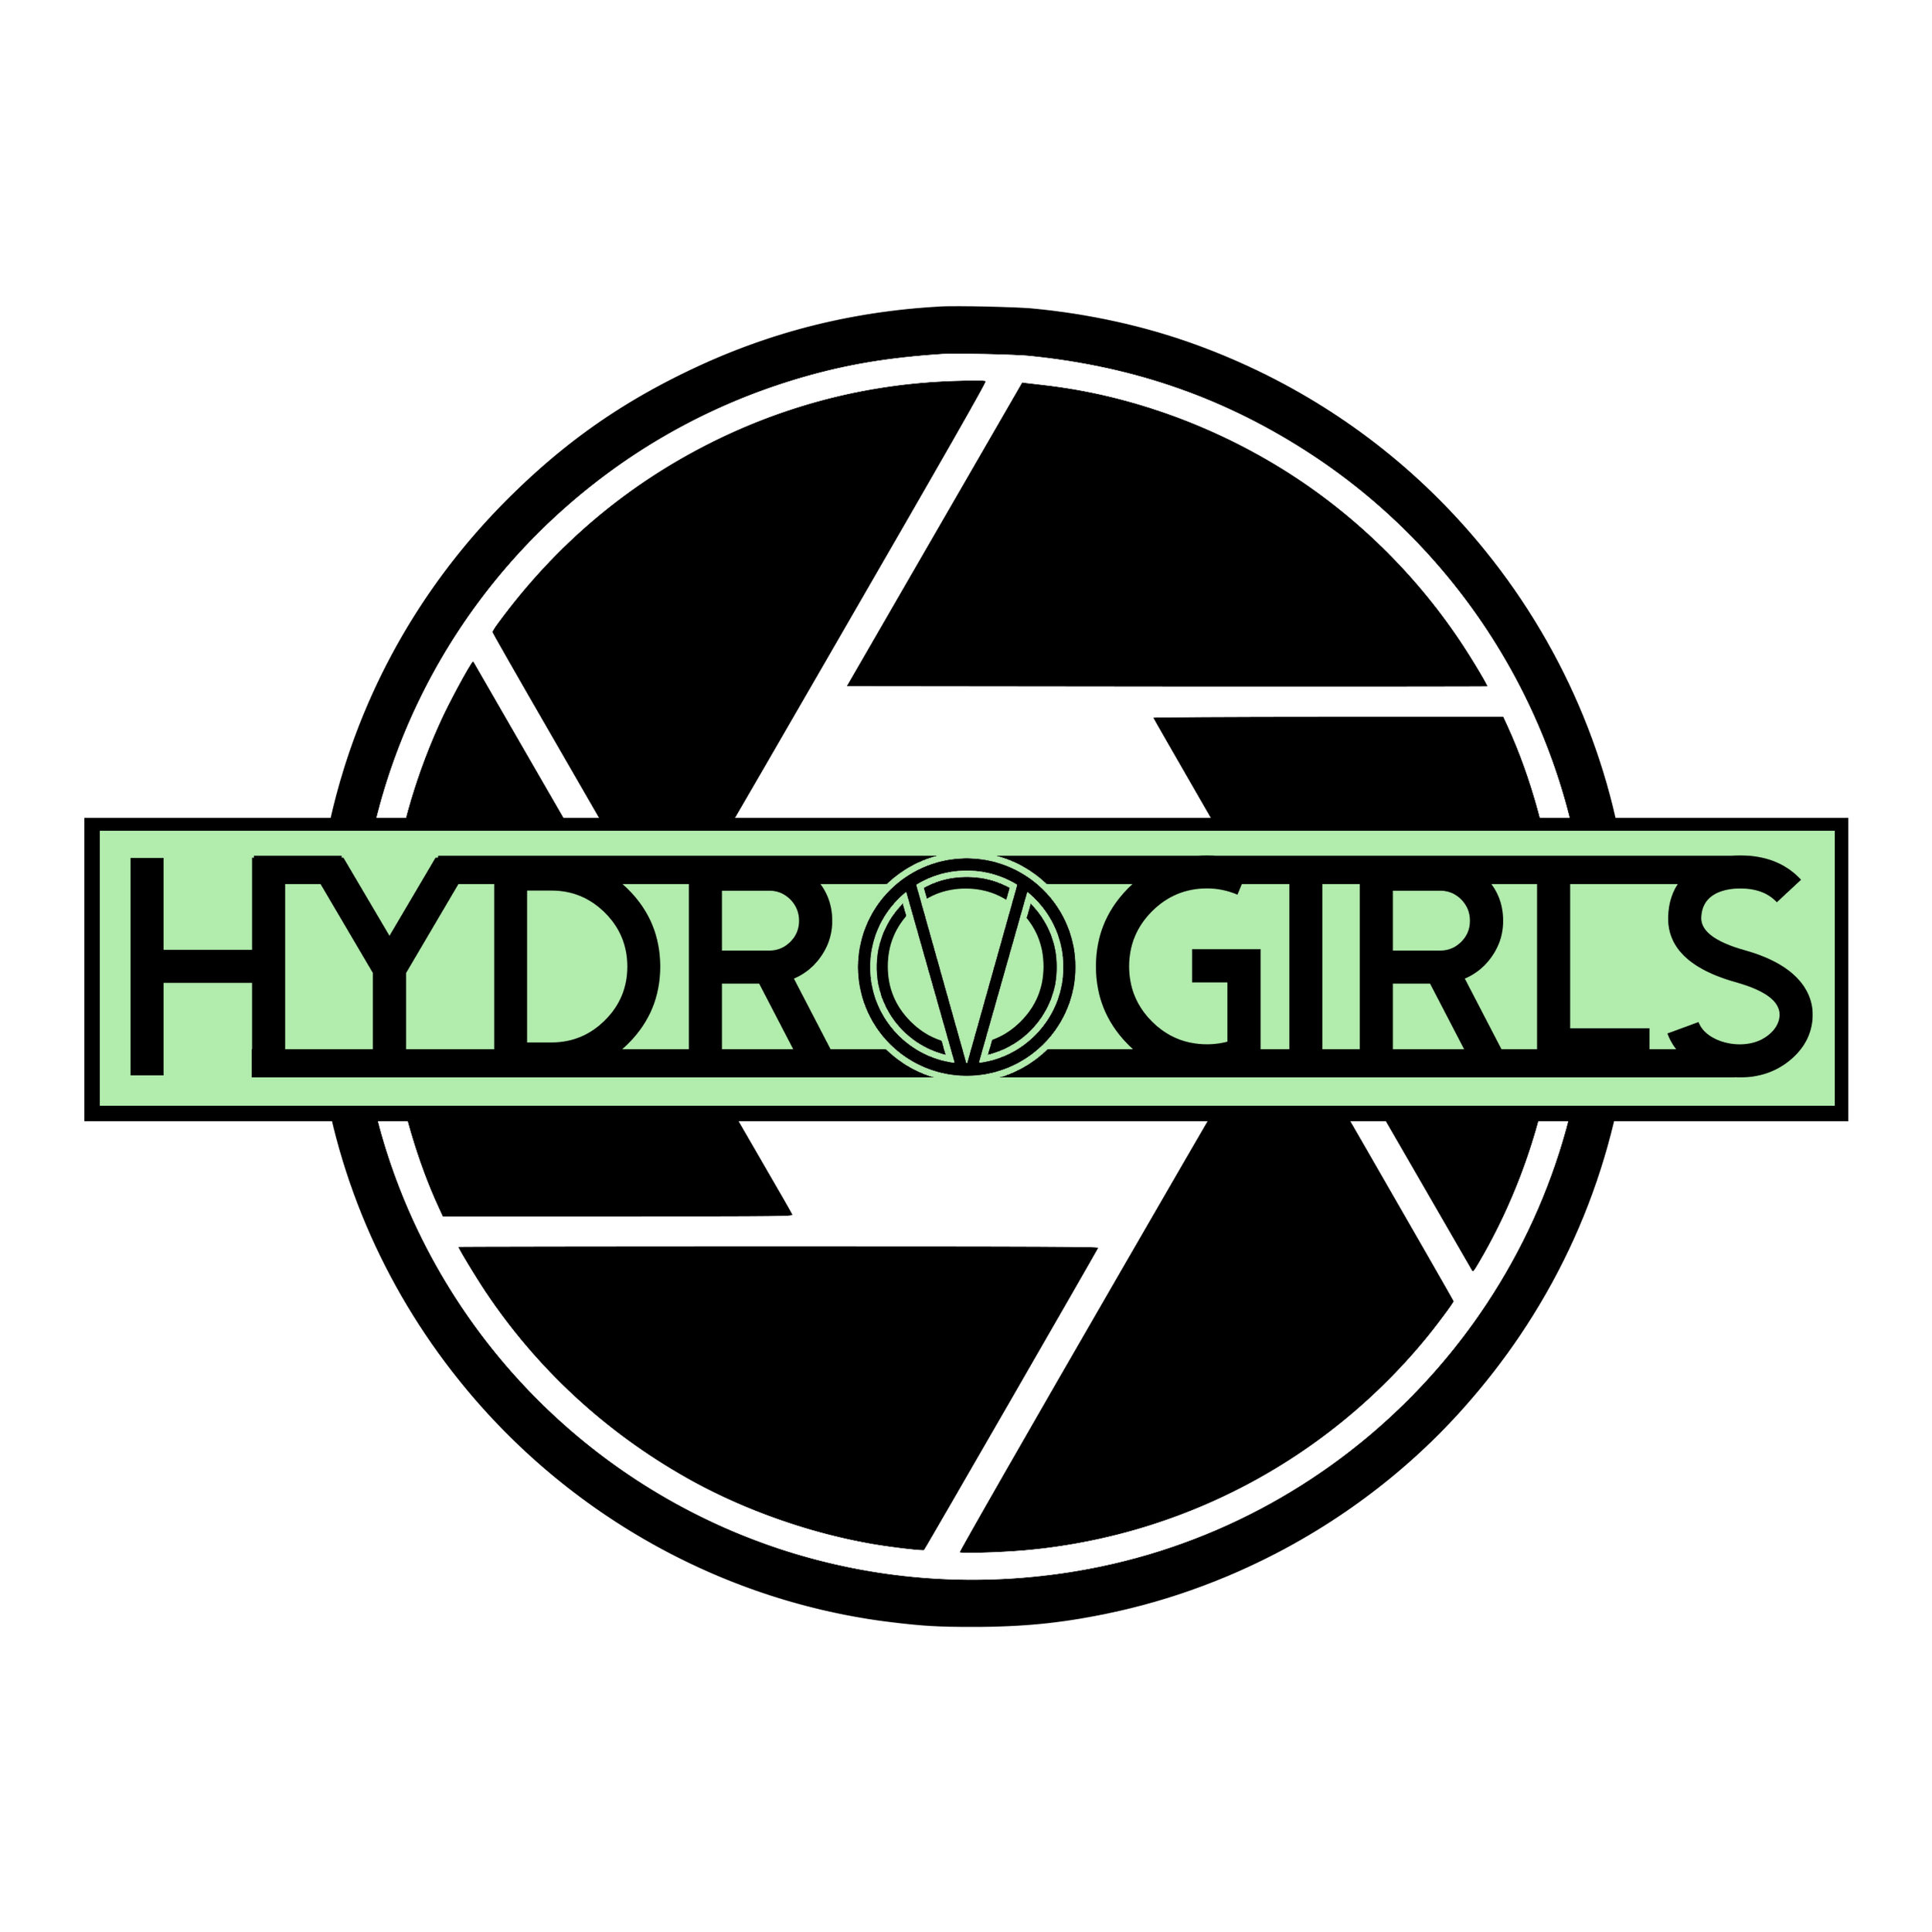 HYDRO GIRLS 2.jpg